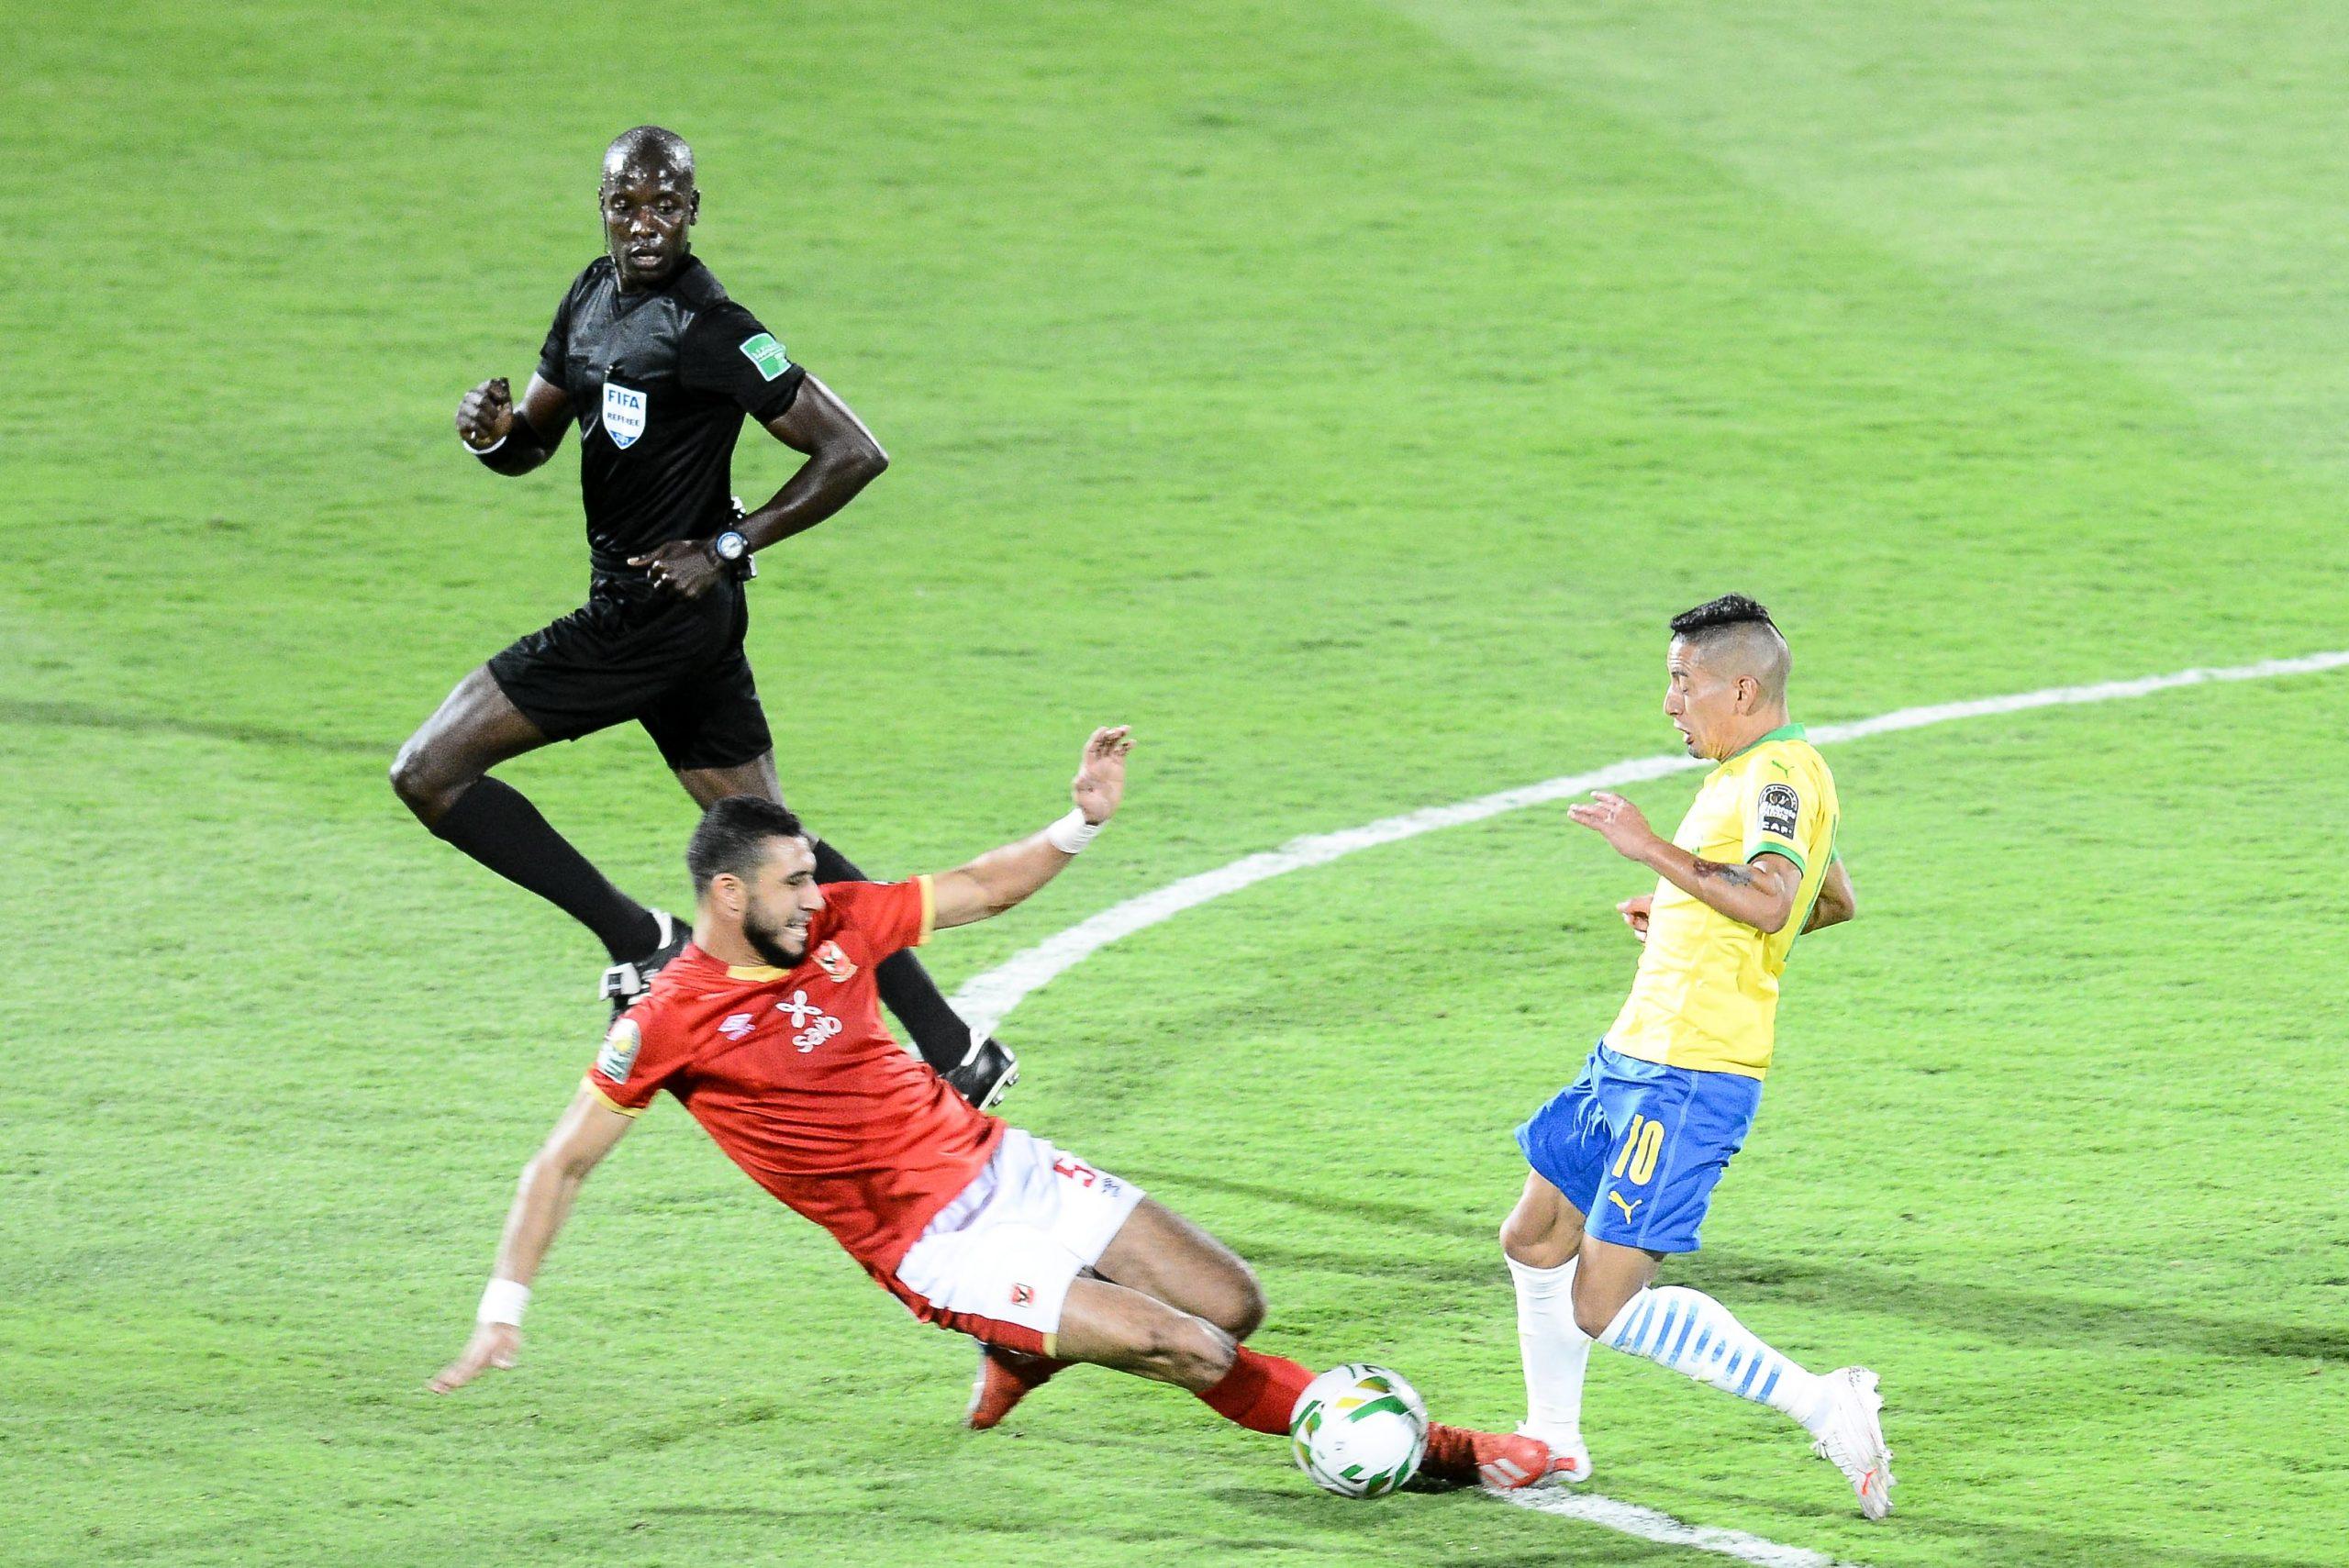 Sundowns coach confident of qualifying despite Cairo defeat